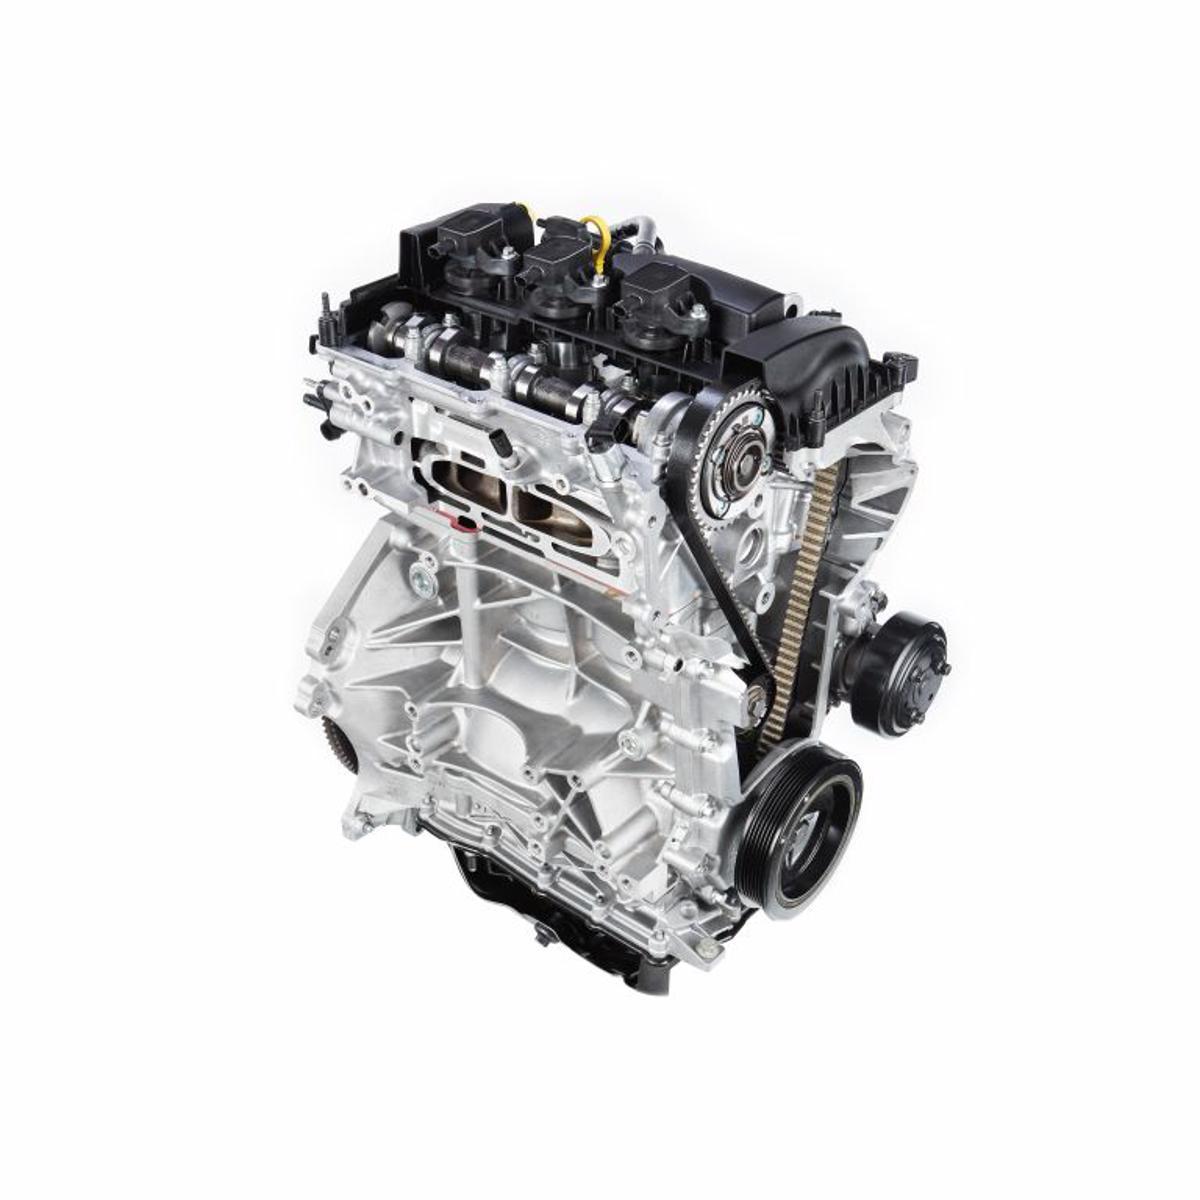 Motor 1.5 3C 4